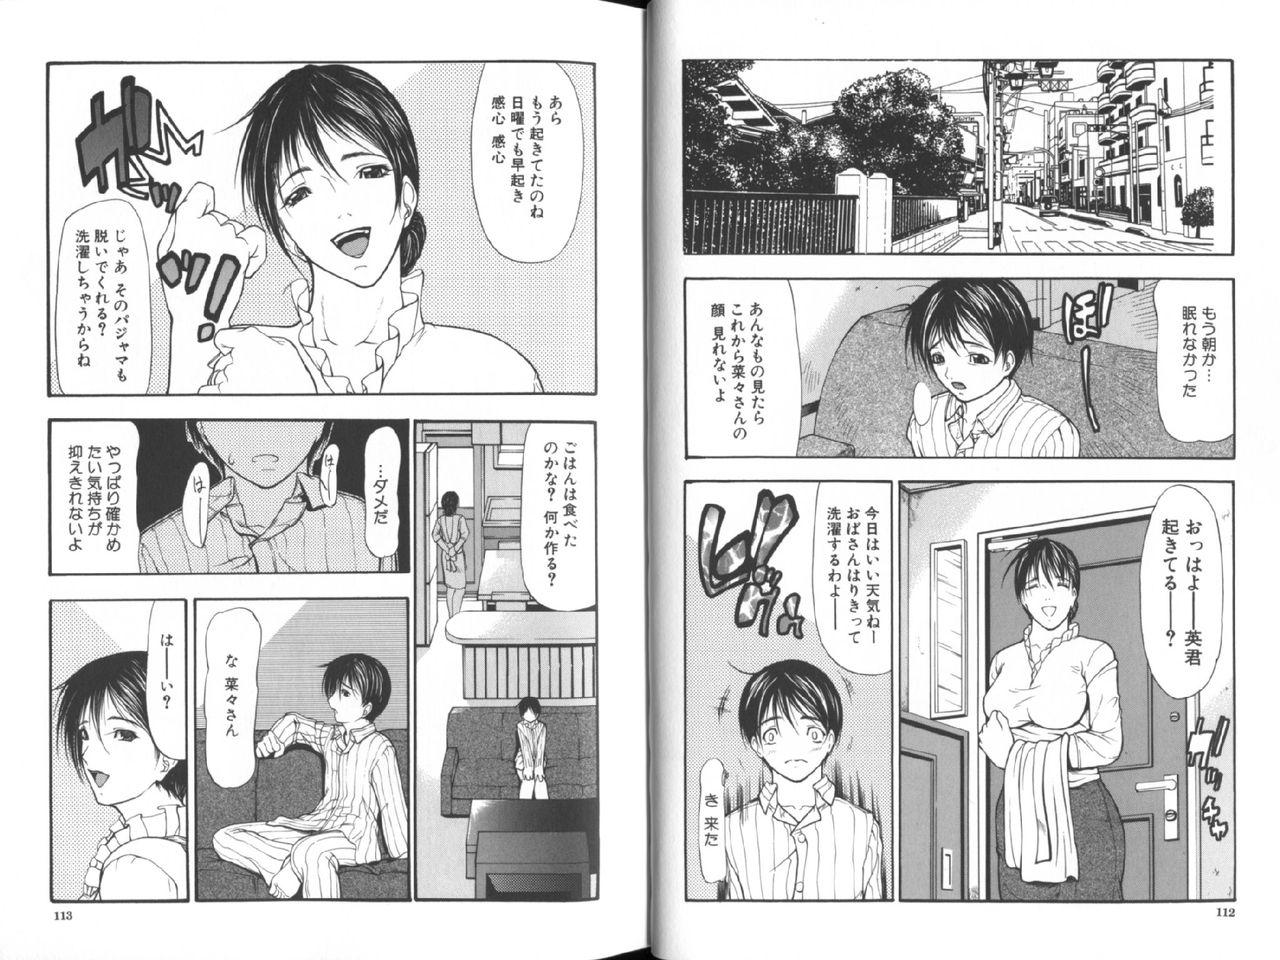 Senjou - A Desire is Instigated 57